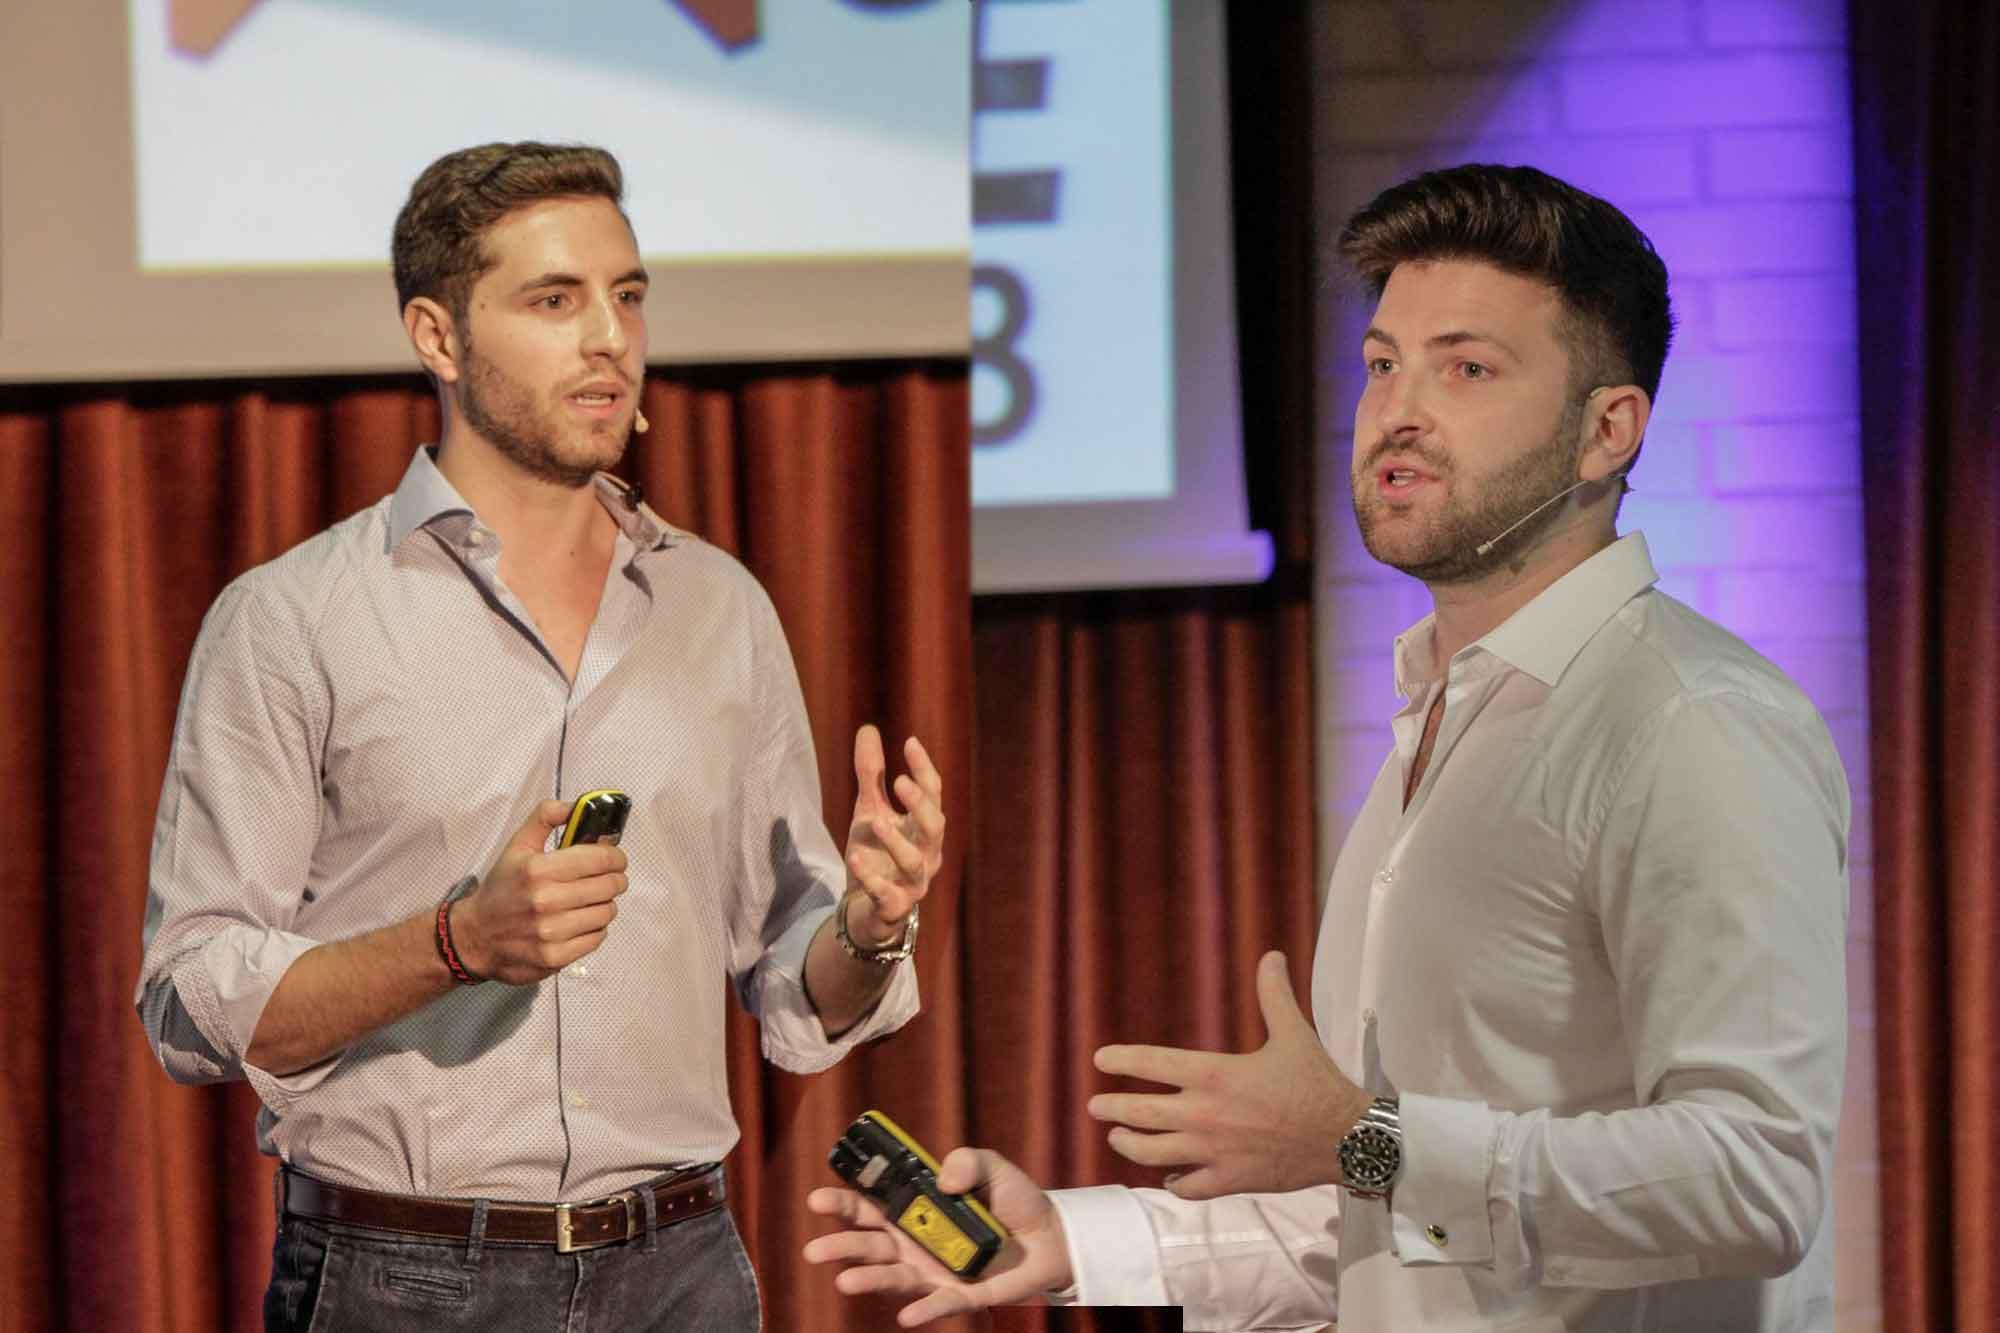 Luca Borreani and Nicolo Manica